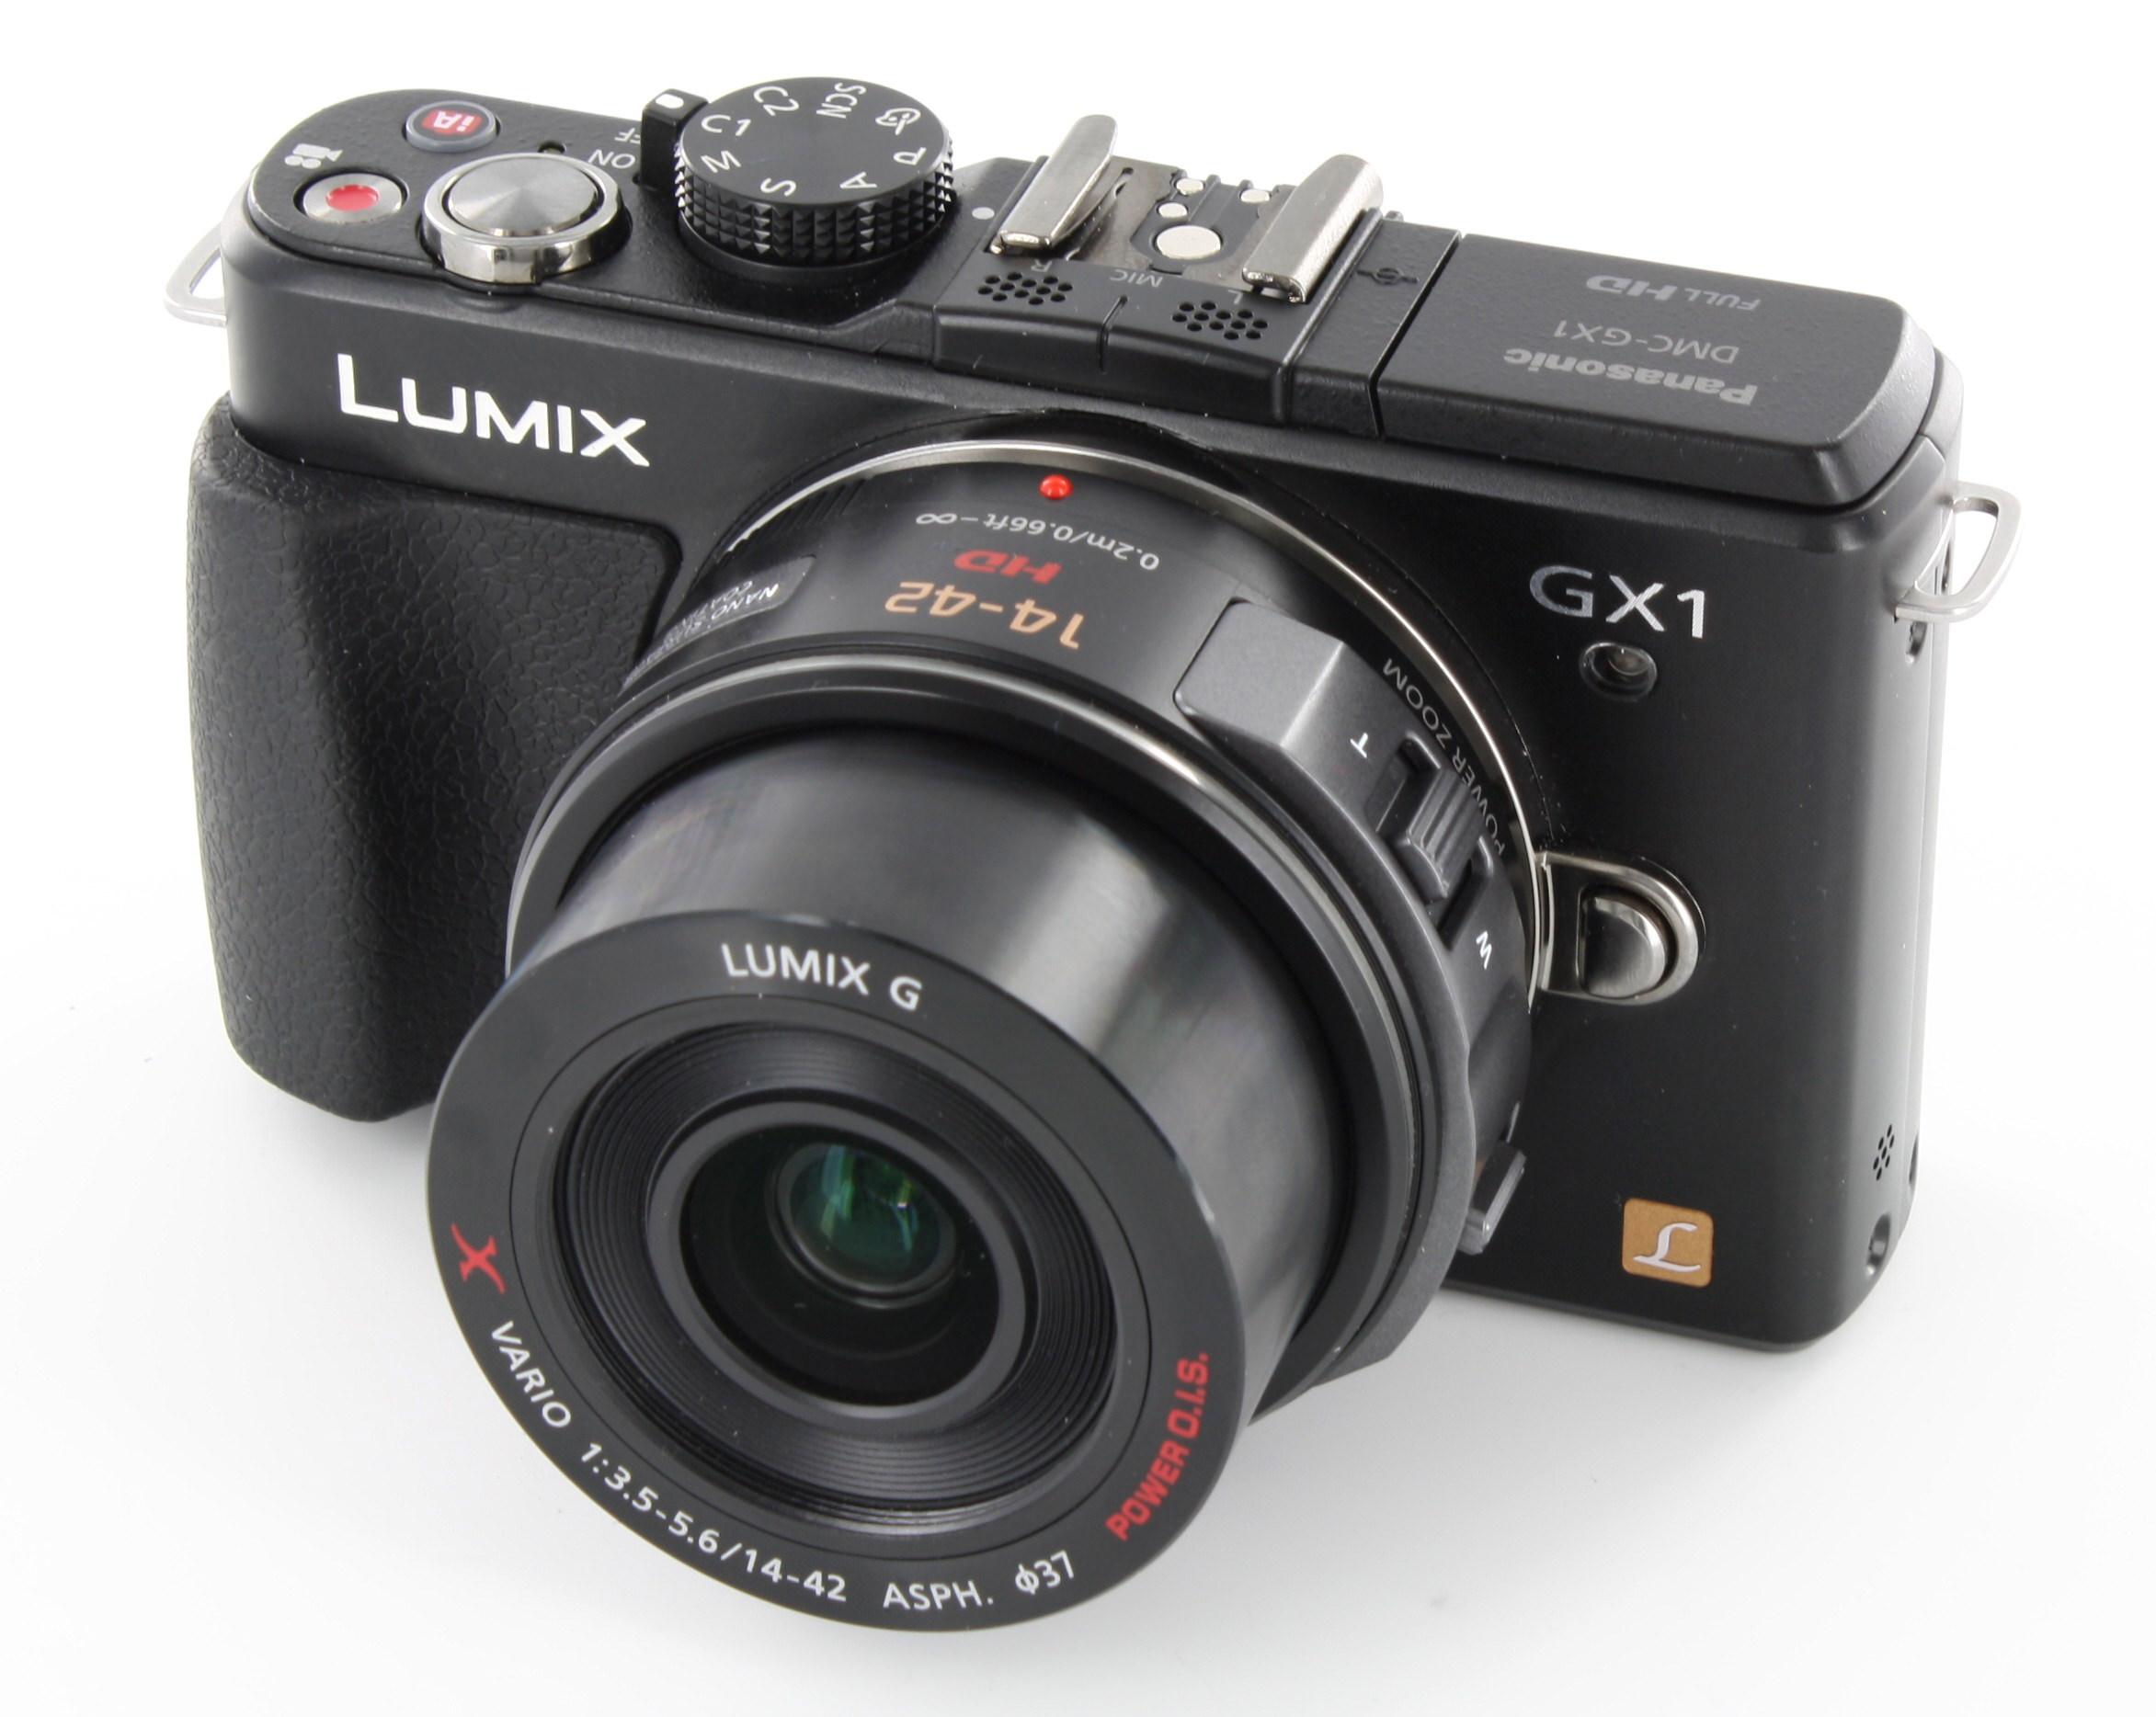 panasonic lumix dmc gx1 camera review rh ephotozine com Lumix GX7 Lumix GM1